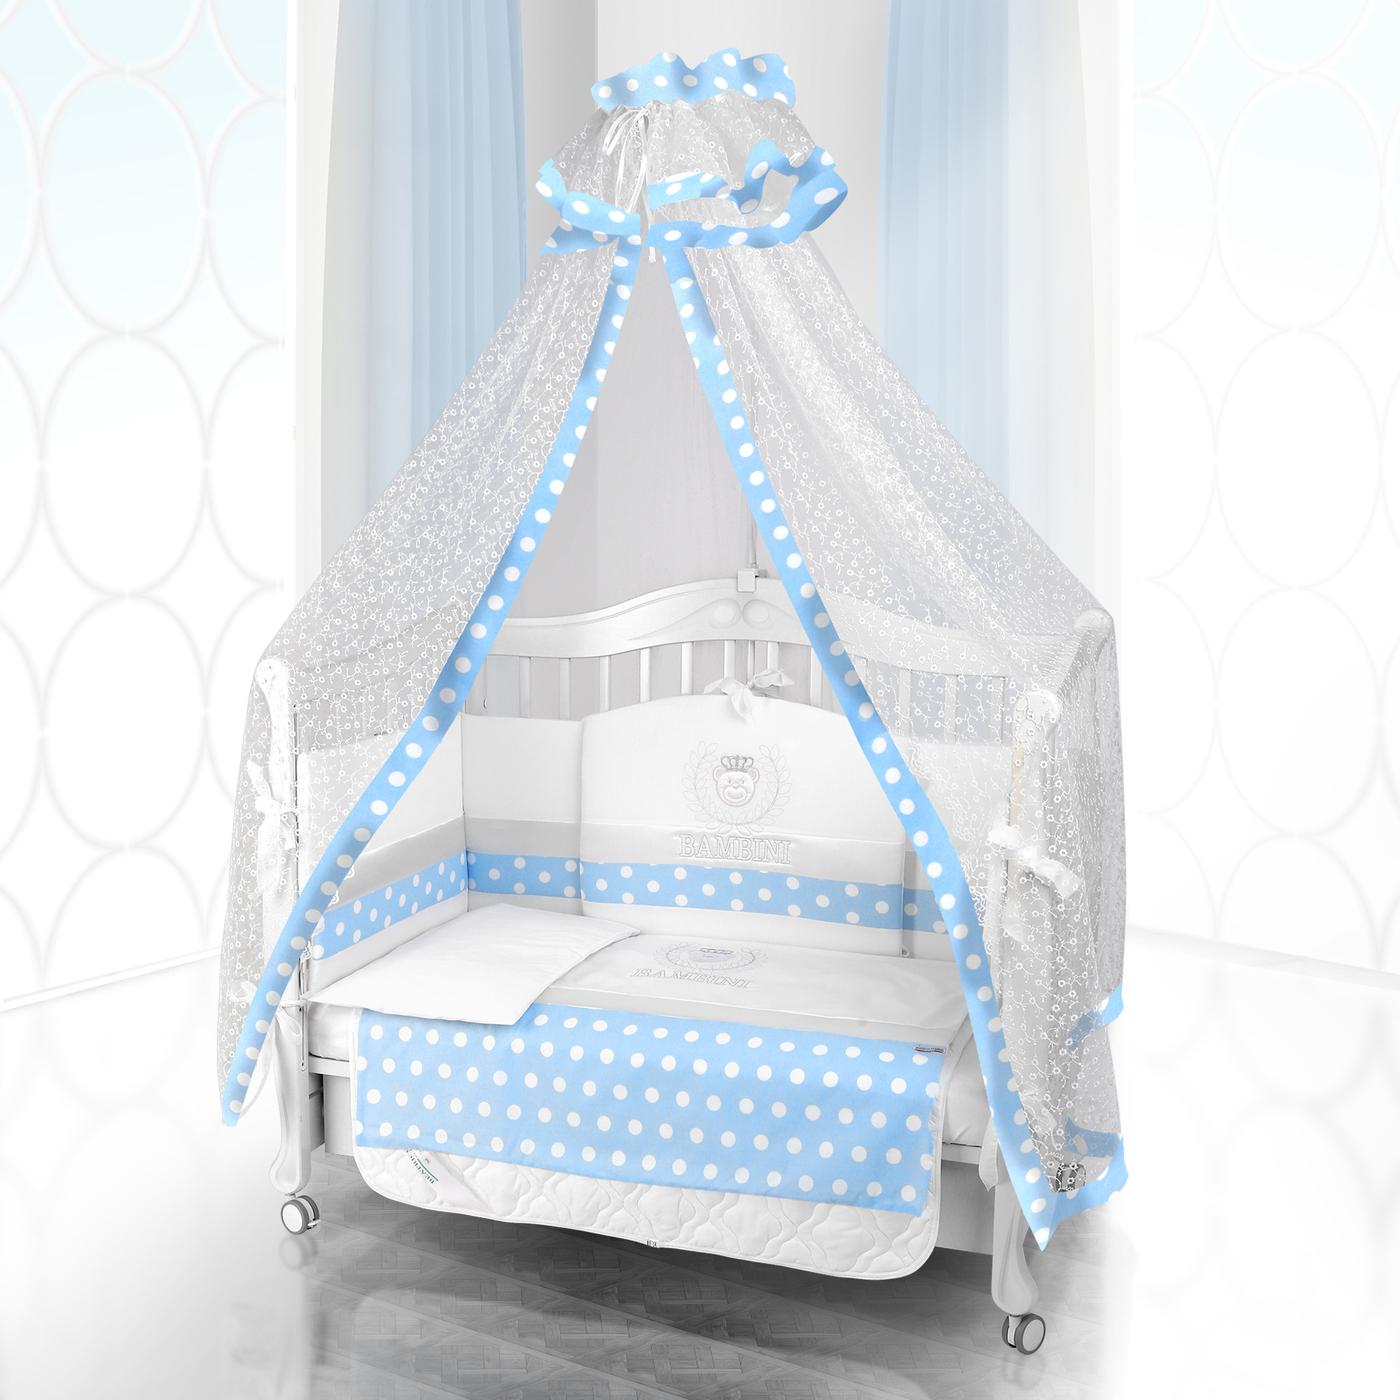 Комплект постельного белья Beatrice Bambini Unico Guseppe Ottaviani (125х65) - bianco& blu